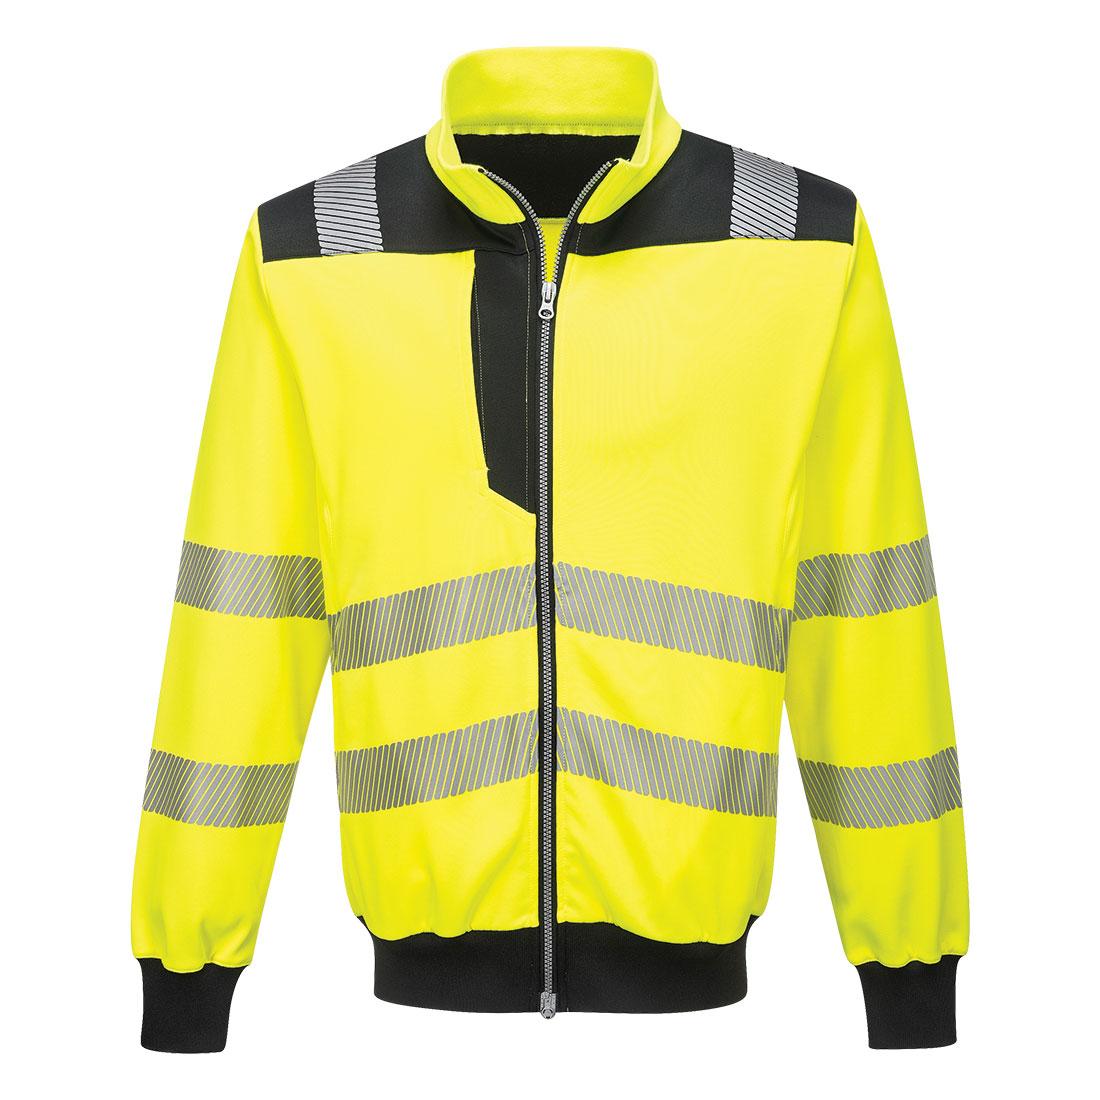 PW3 Hi-Vis Sweatshirt Yellow/Black XXXLR